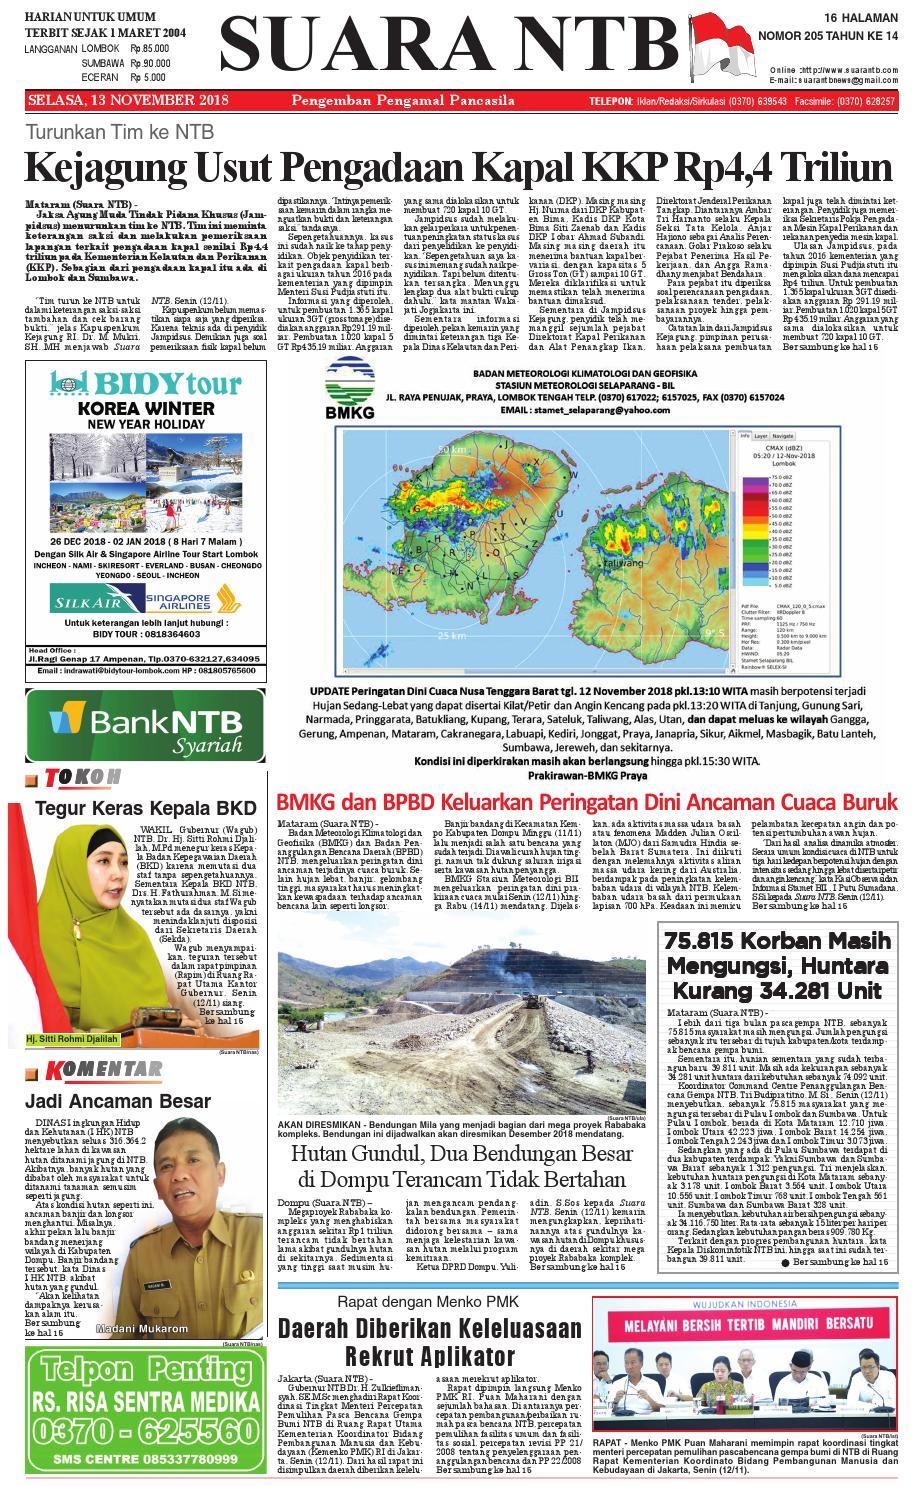 Edisi Selasa 13 November 2018 Suara Ntb By E Paper Kmb Issuu